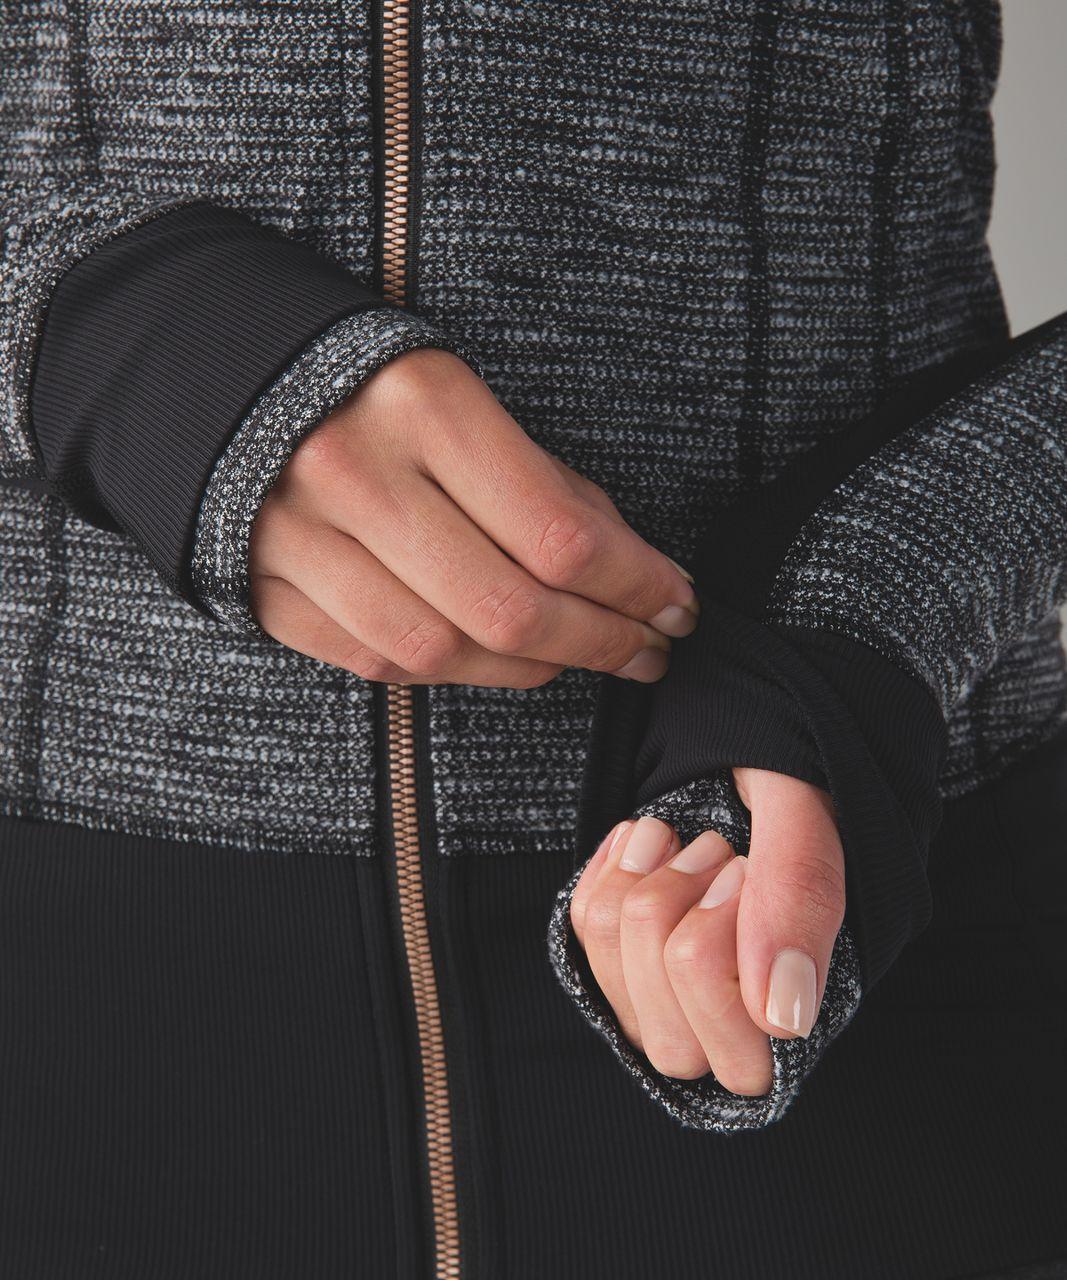 Lululemon Daily Practice Jacket - Coco Pique Black White